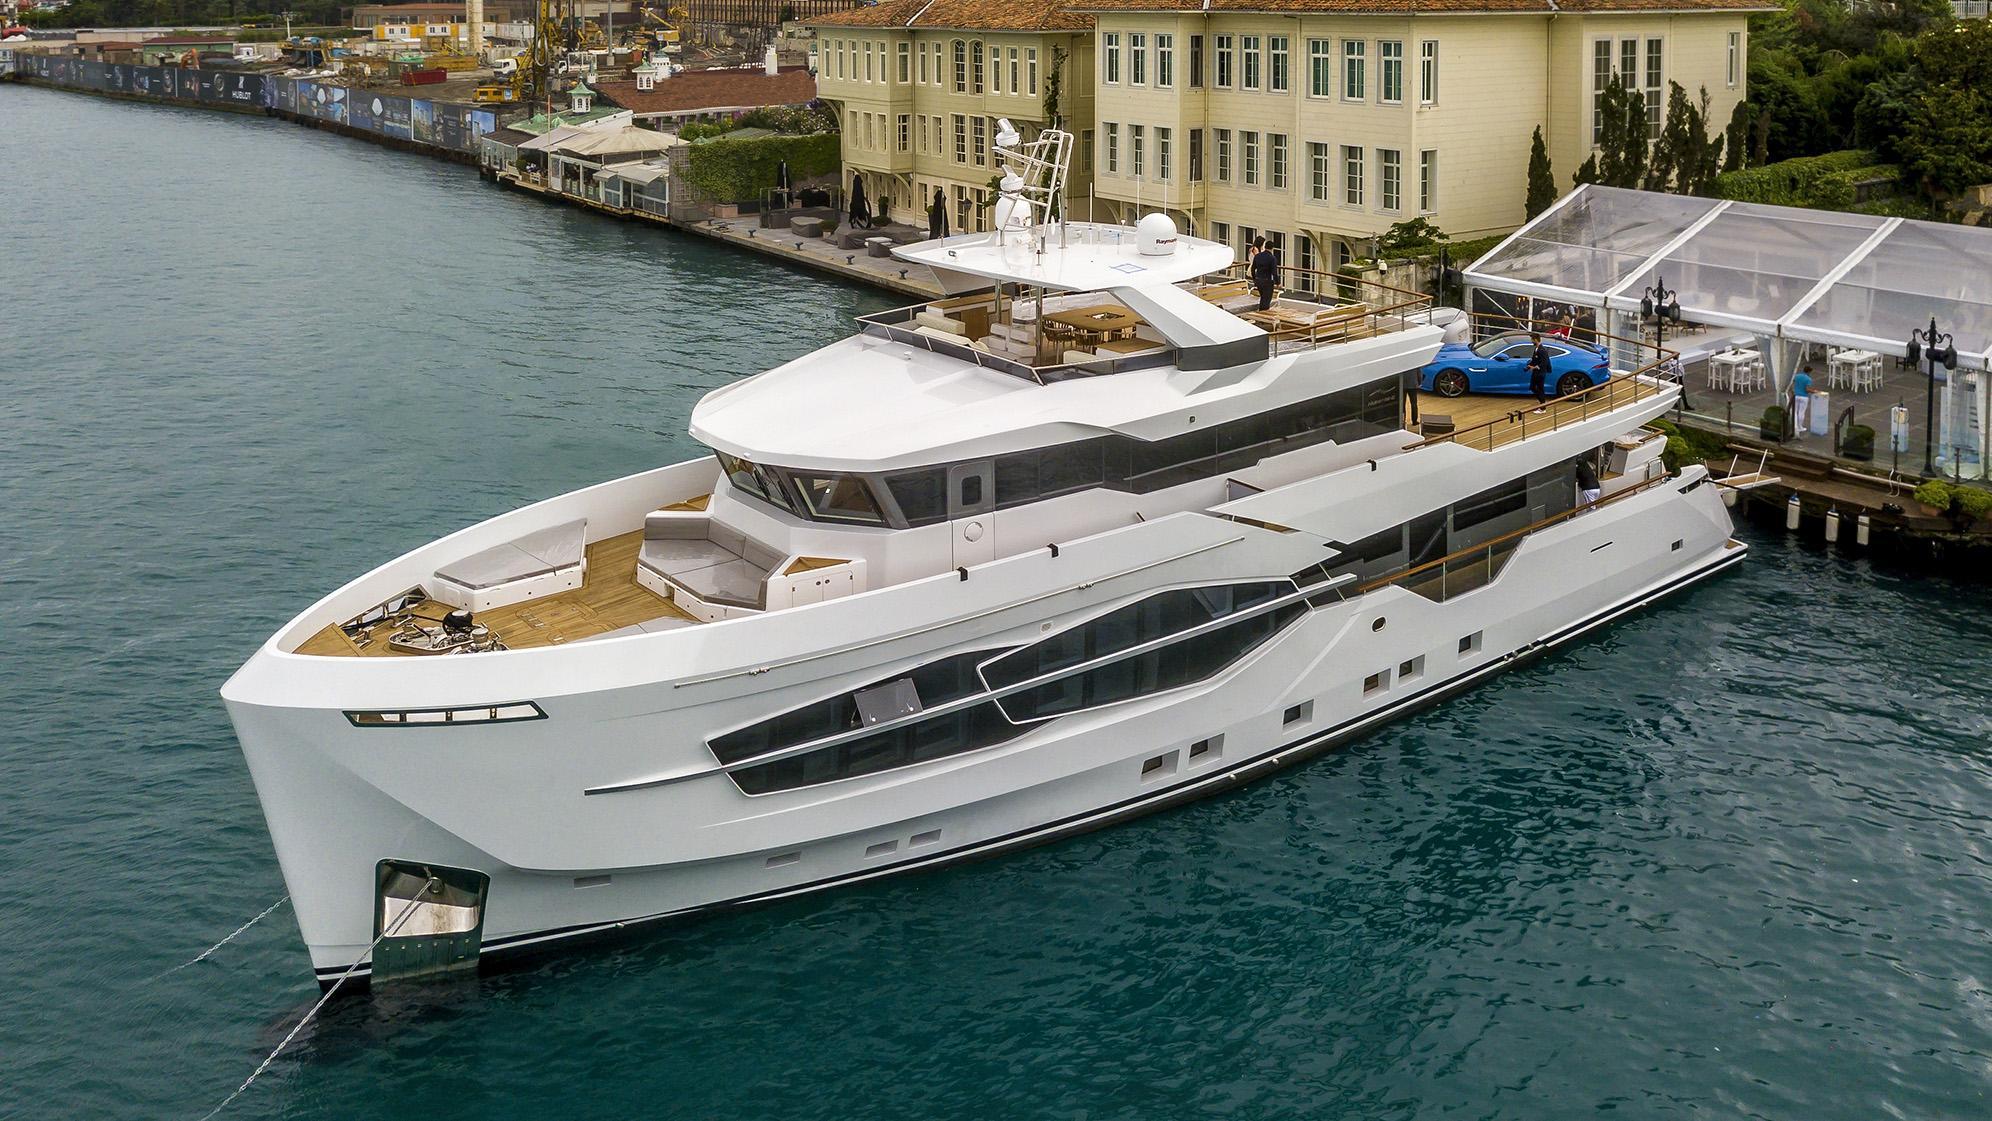 calliope motoryacht numarine 32m 2018 half profile sistership